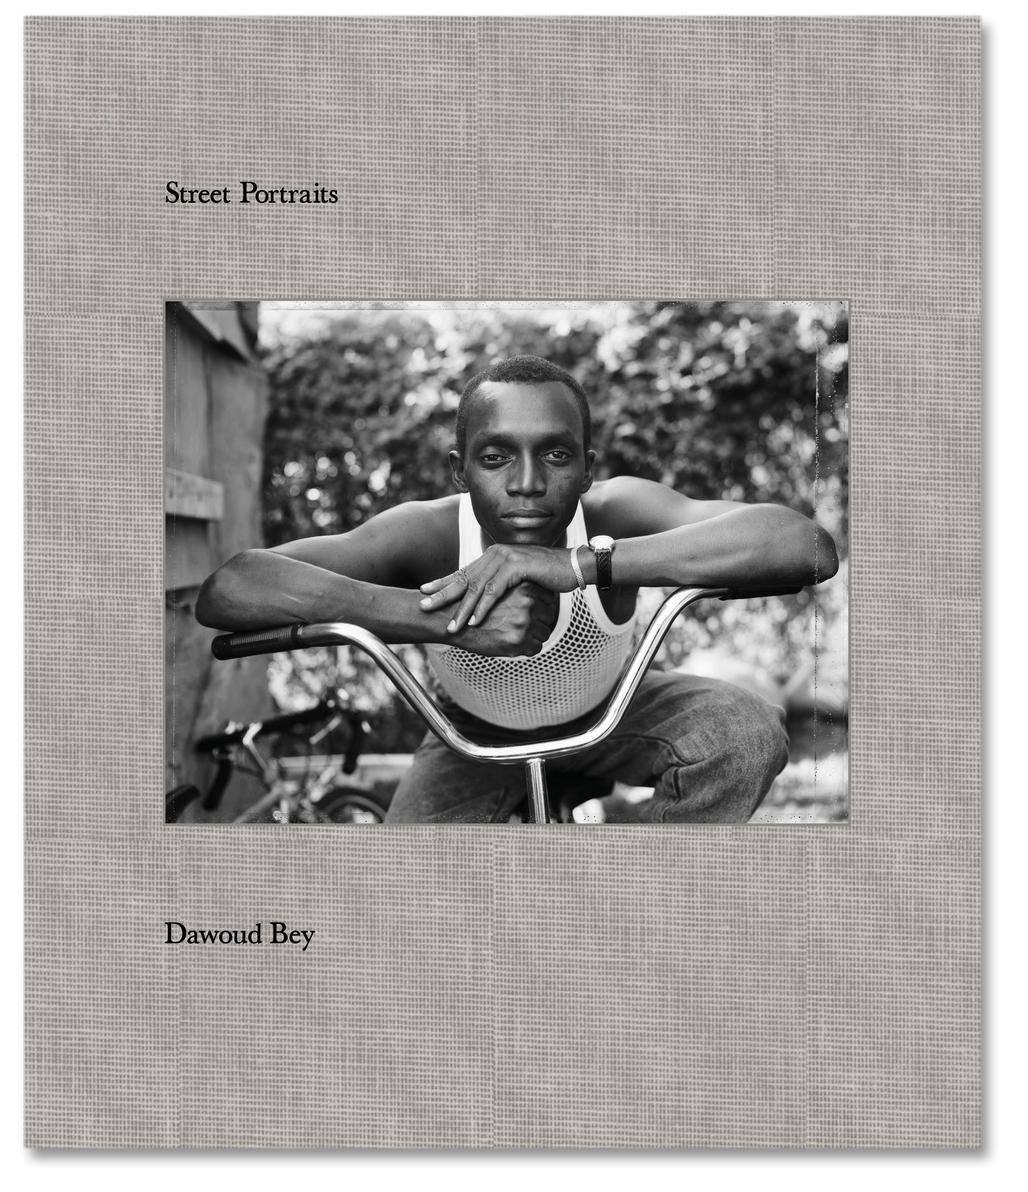 Dawoud Bey, Street Portraits MACK photography book